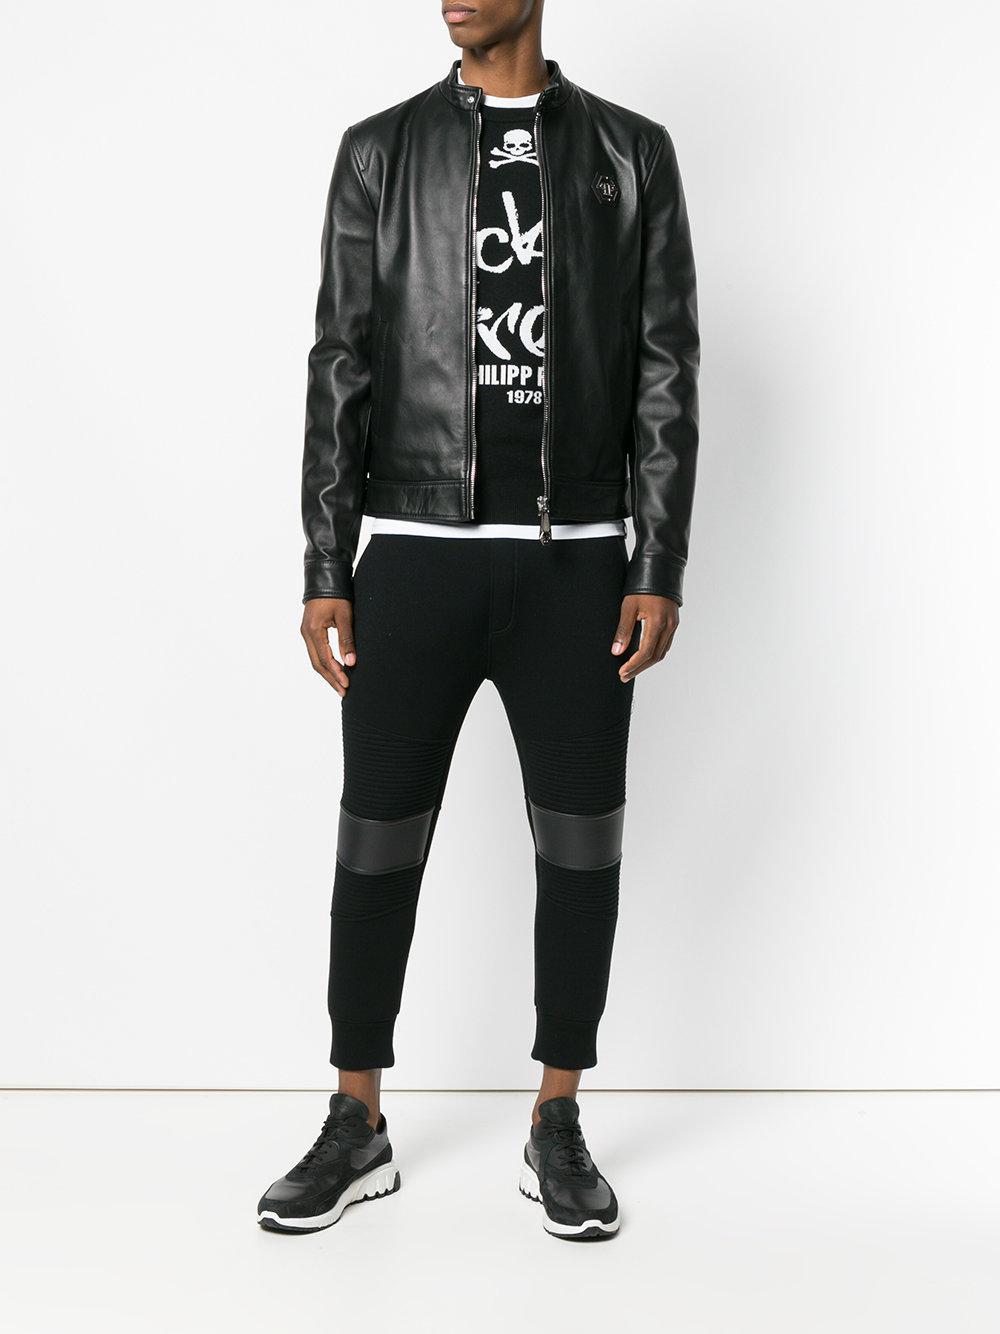 dd1595546e Philipp Plein Original Moto Jacket in Black for Men - Lyst